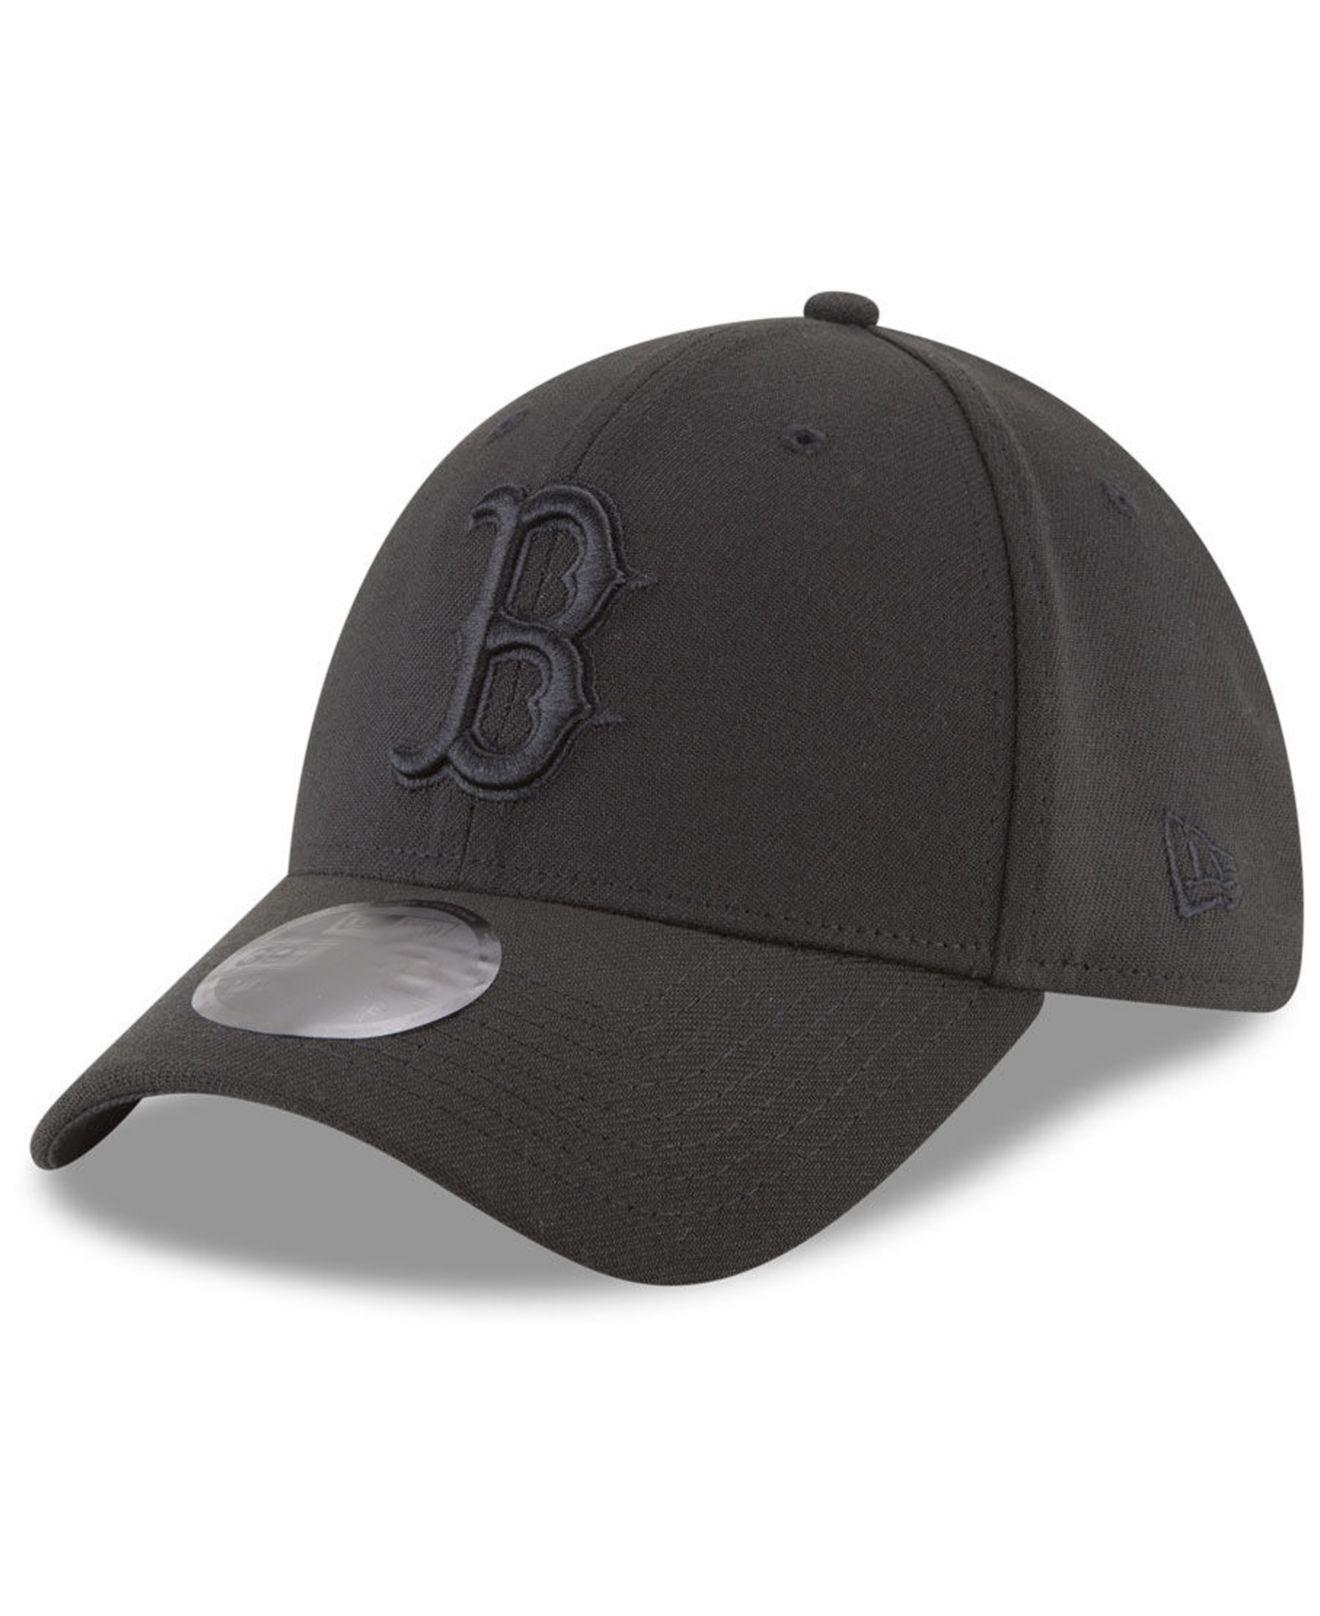 Lyst - KTZ Boston Red Sox Blackout 39thirty Cap in Black for Men 31cea070096d